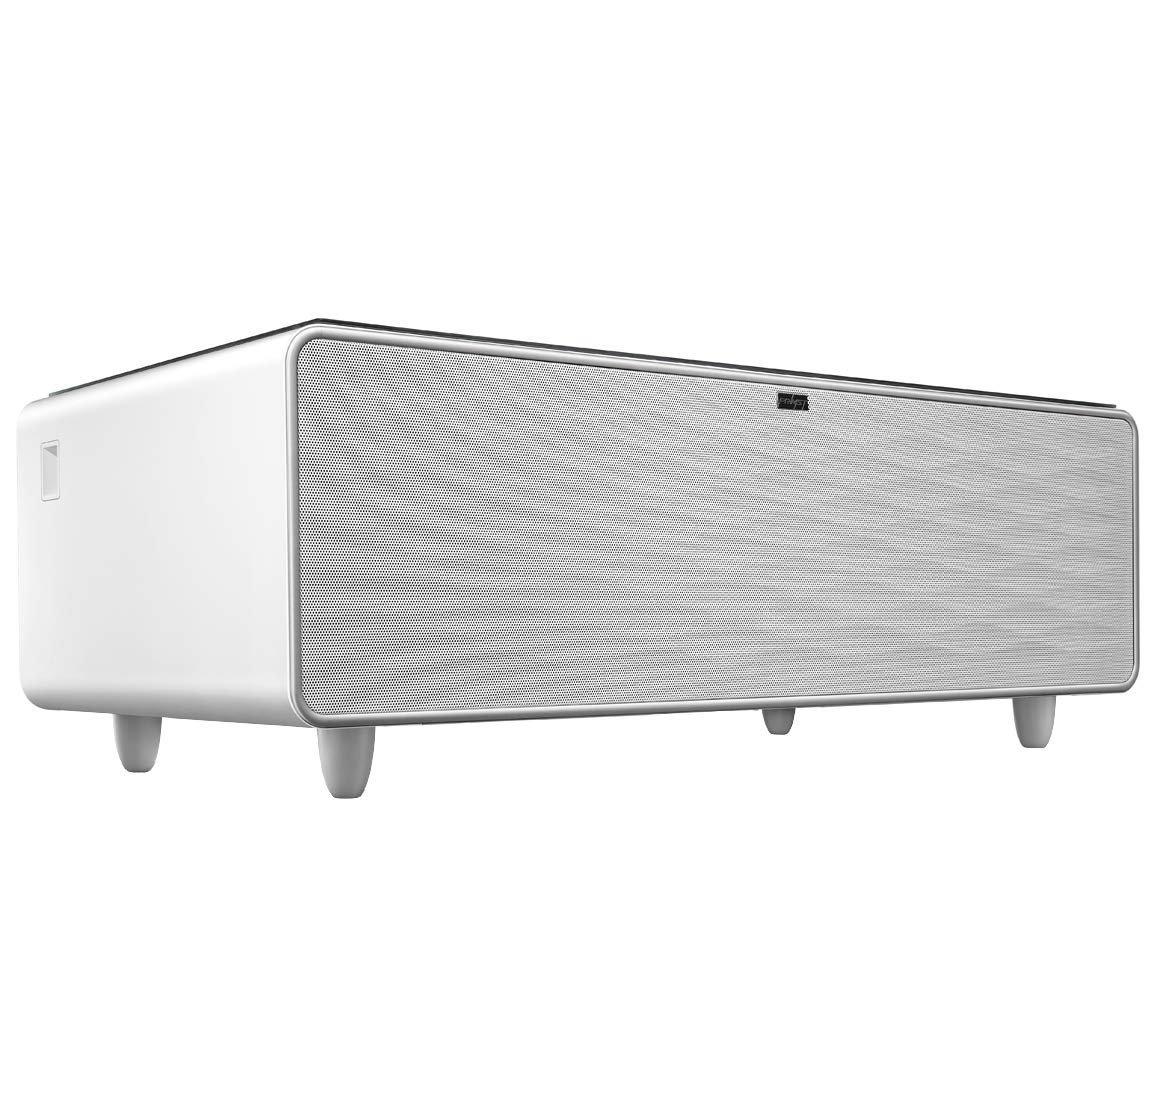 Refrigerator Coffee Table.Refrigerator Coffee Table